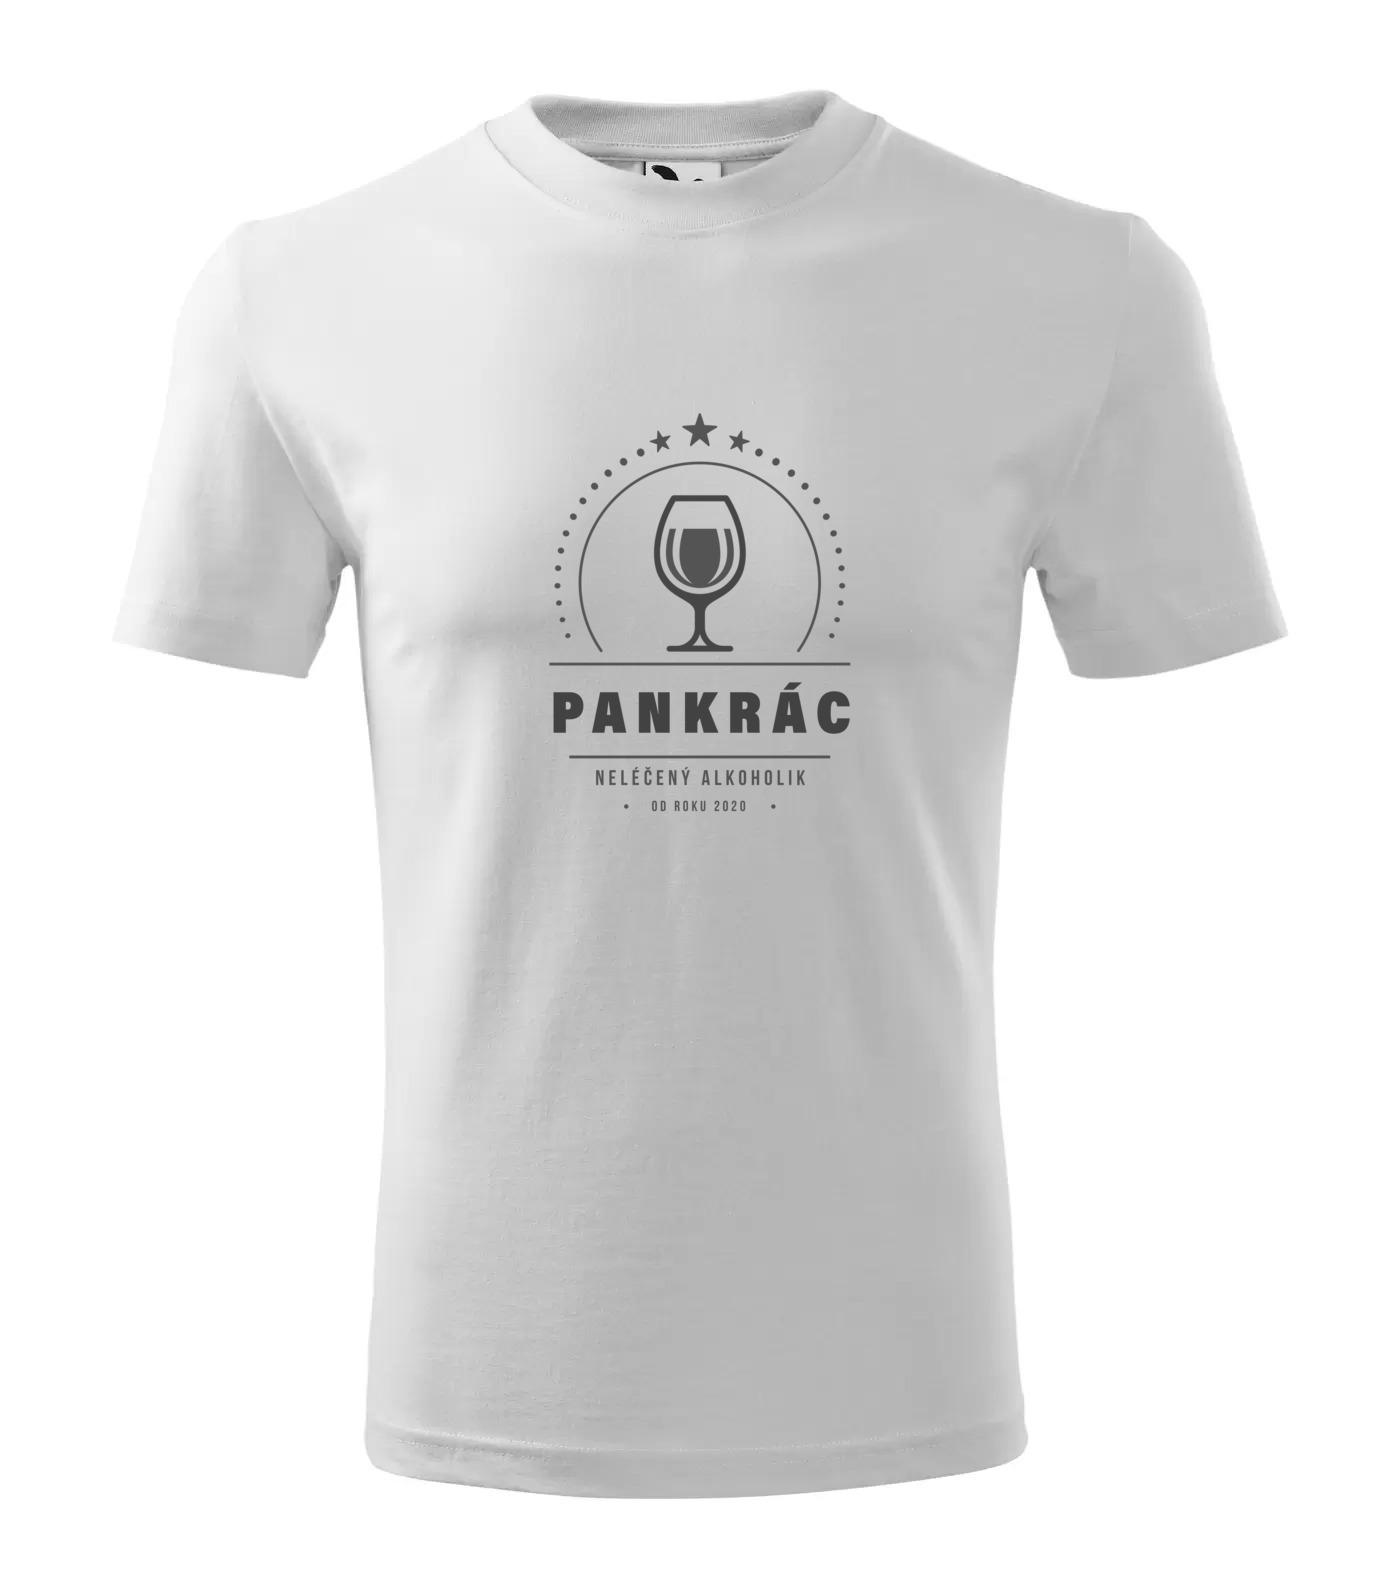 Tričko Alkoholik Pankrác